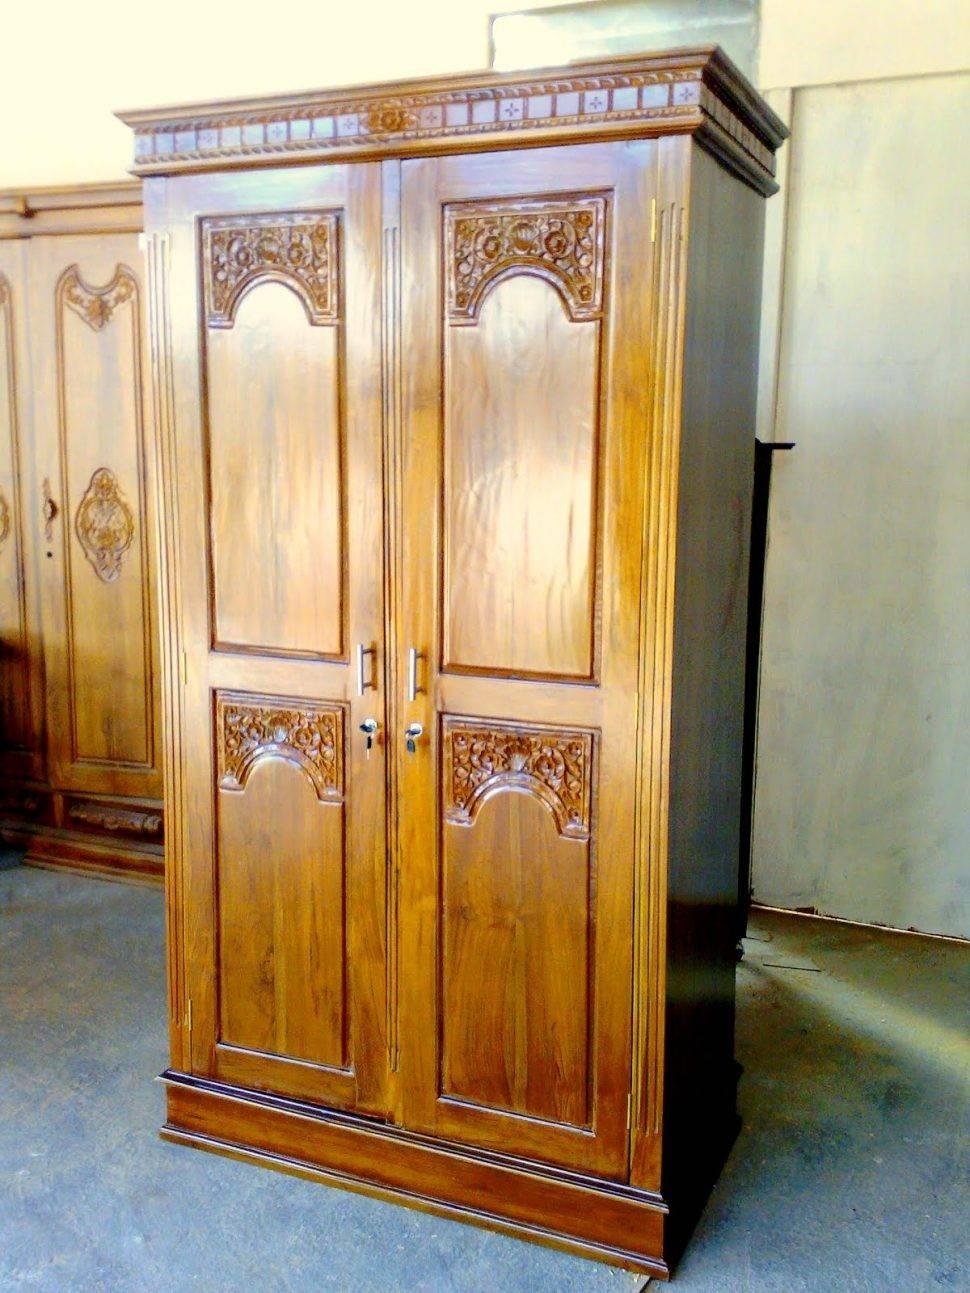 Bedroom Furniture : Antique Armoire Oak Wardrobes Uk Beautiful pertaining to Antique White Wardrobes (Image 3 of 15)